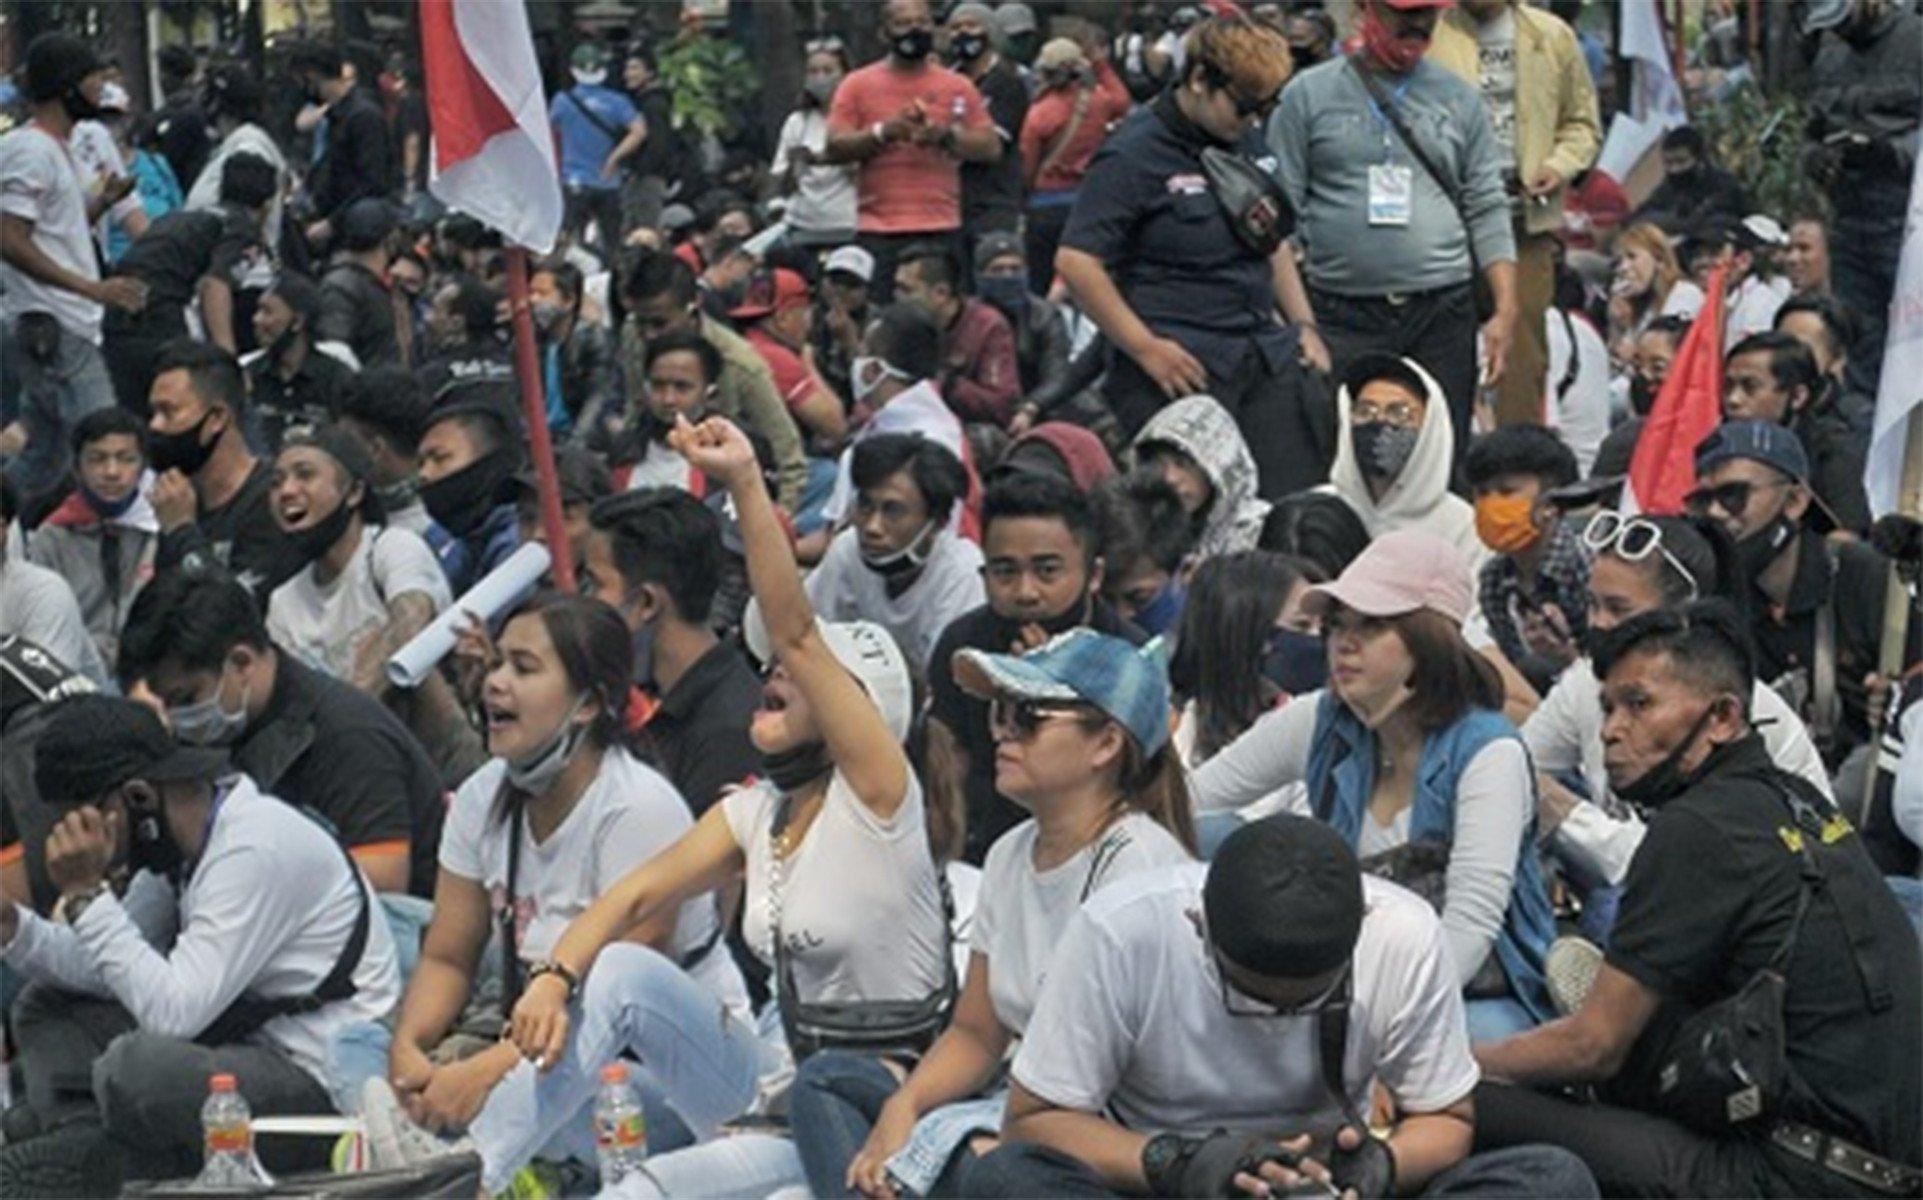 Cerita Rani, LC Karaoke di Bandung, 4 Bulan Tak Ada Pemasukan - JPNN.com